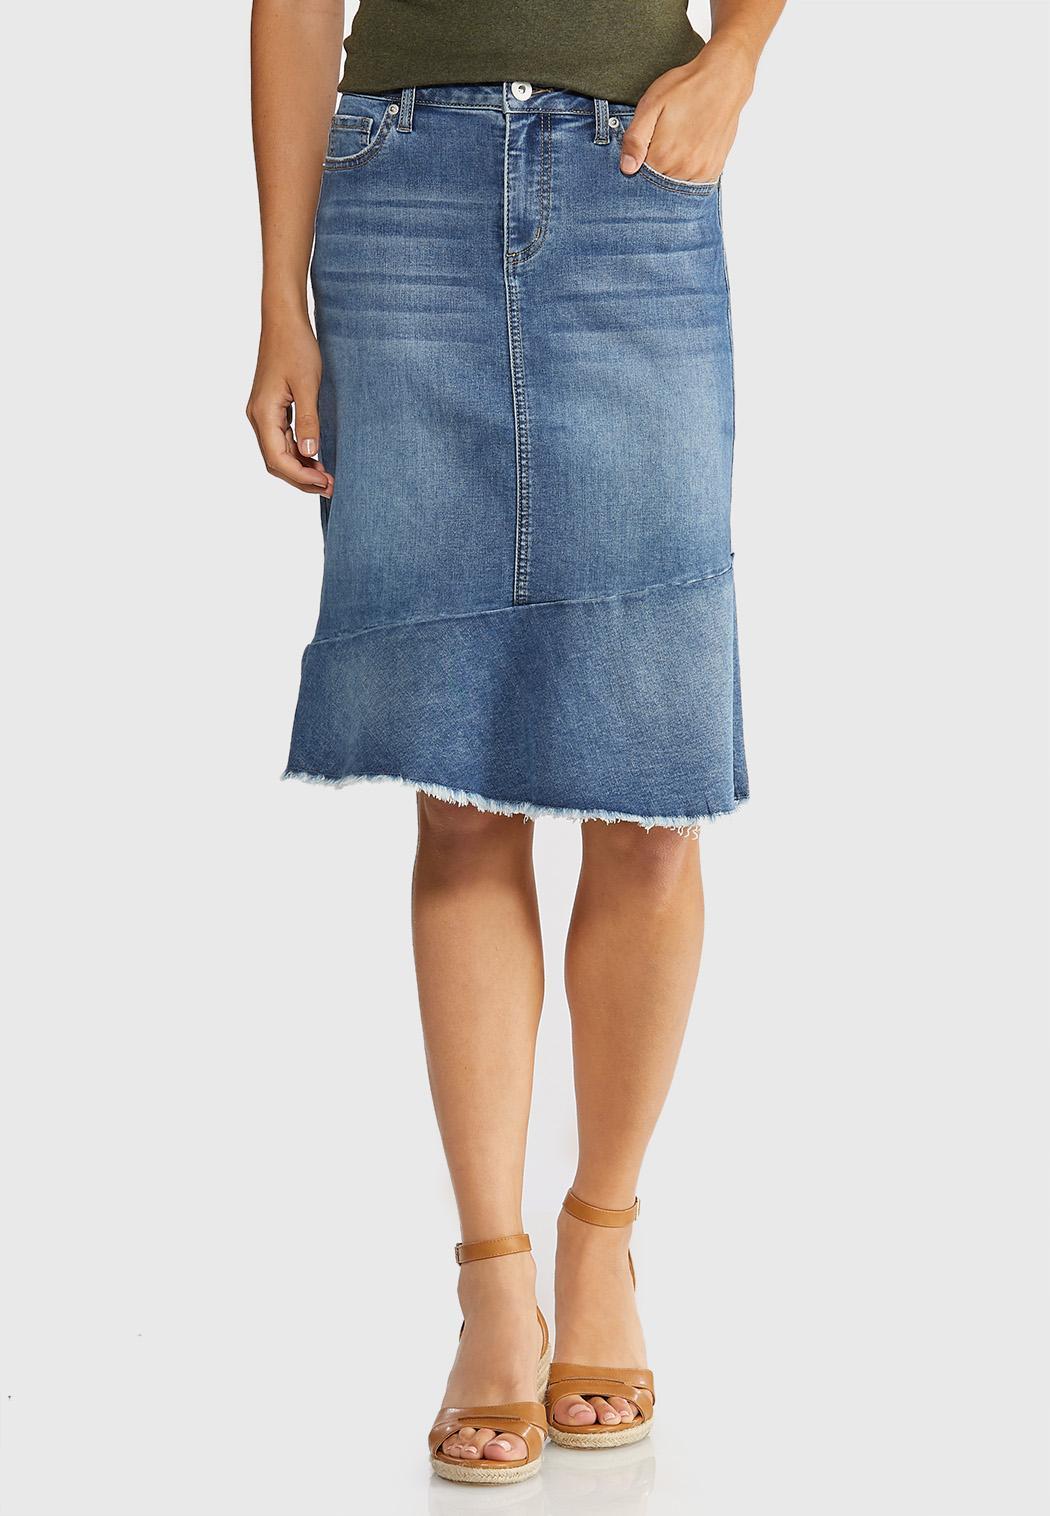 dc637b7290 Jeans For Women - Denim, Jackets, Skirts & Vests